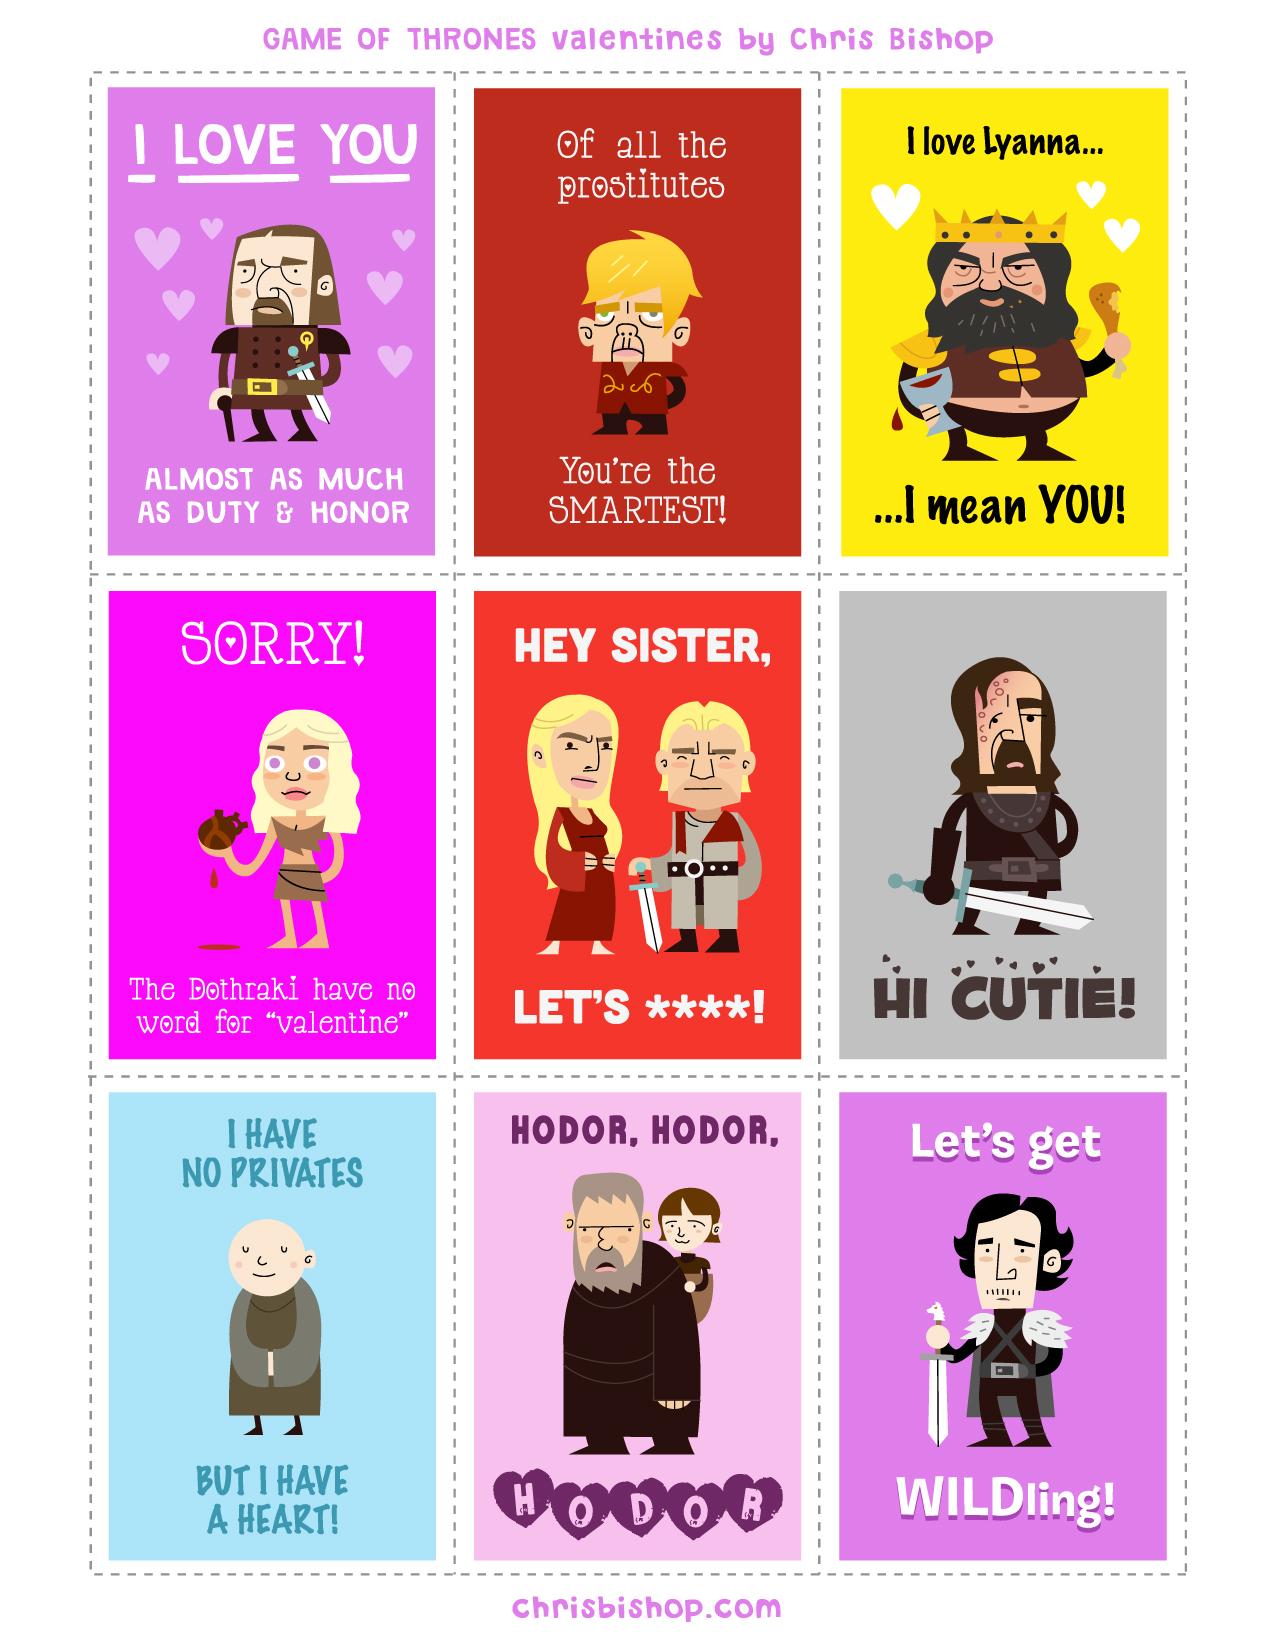 Game of Thrones - Dia dos Namorados